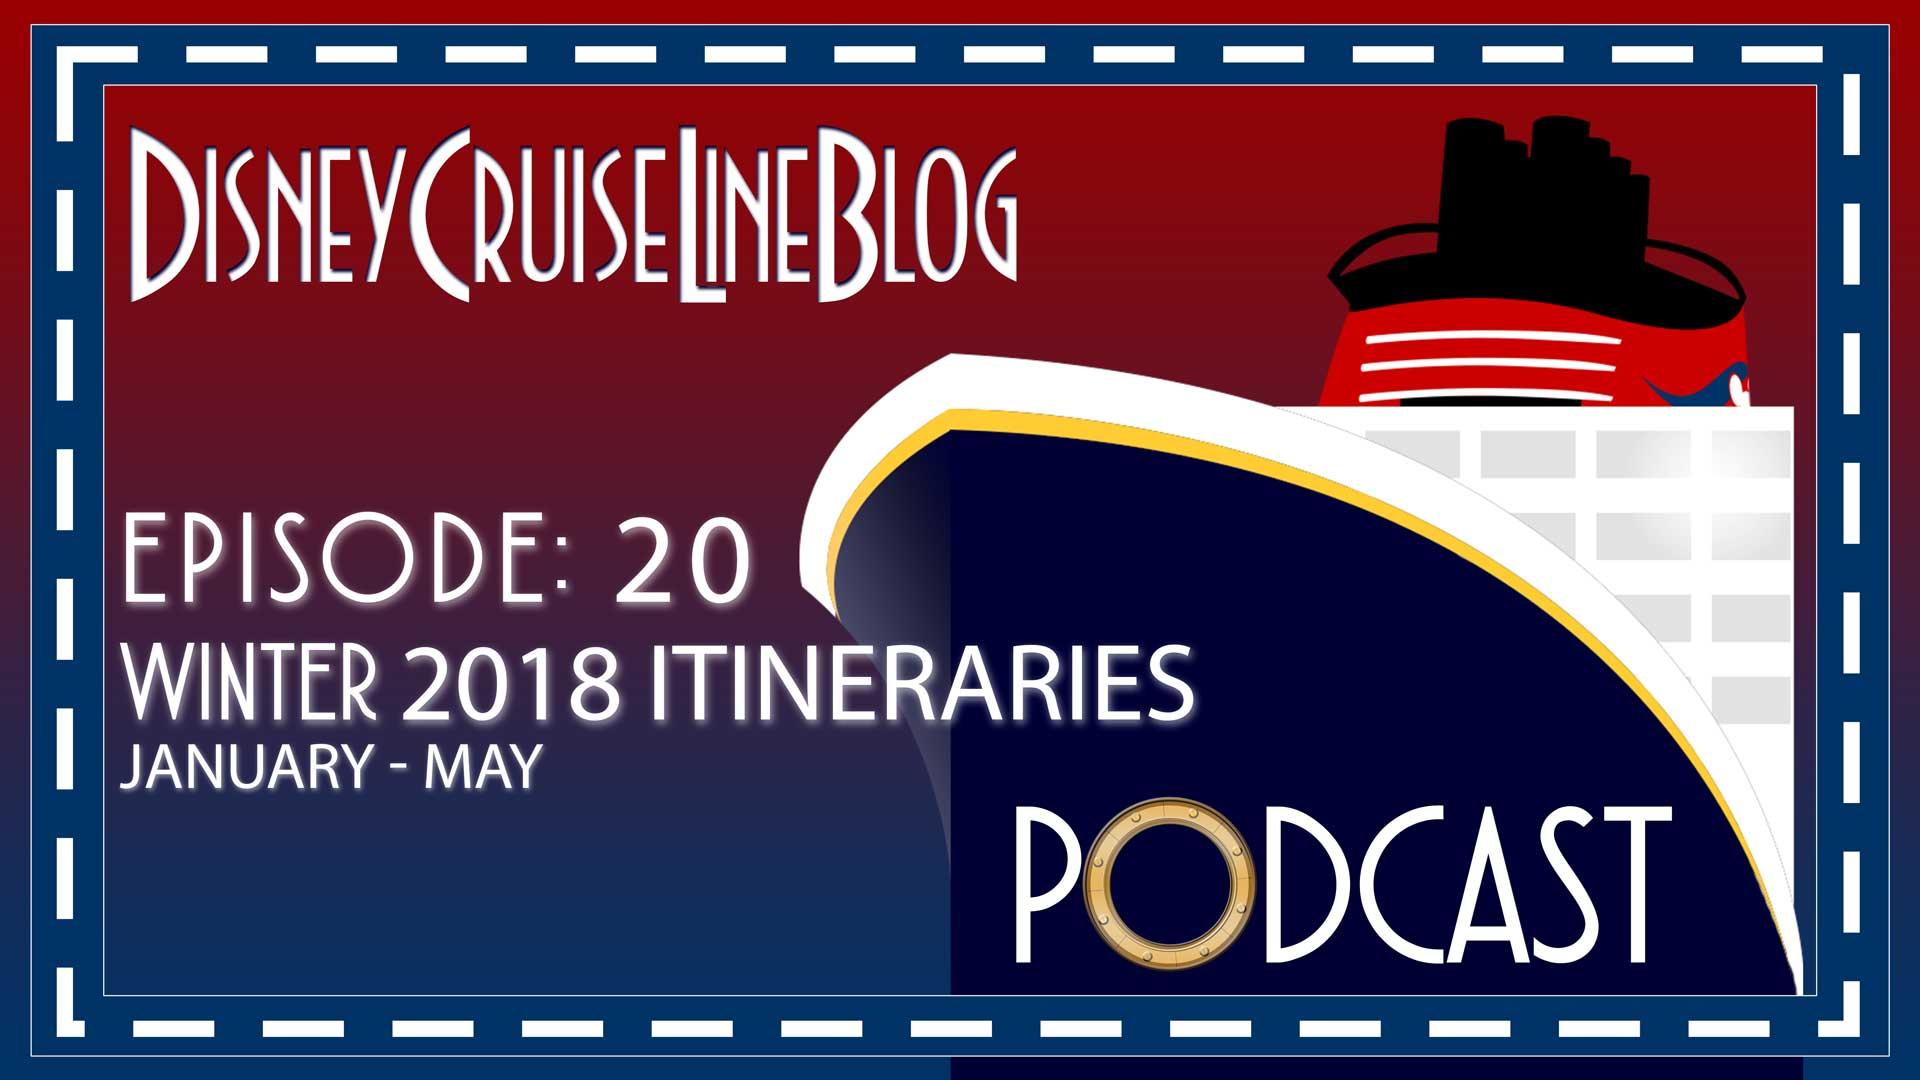 Disney Cruise Line Blog Podcast Episode 20 Winter 2018